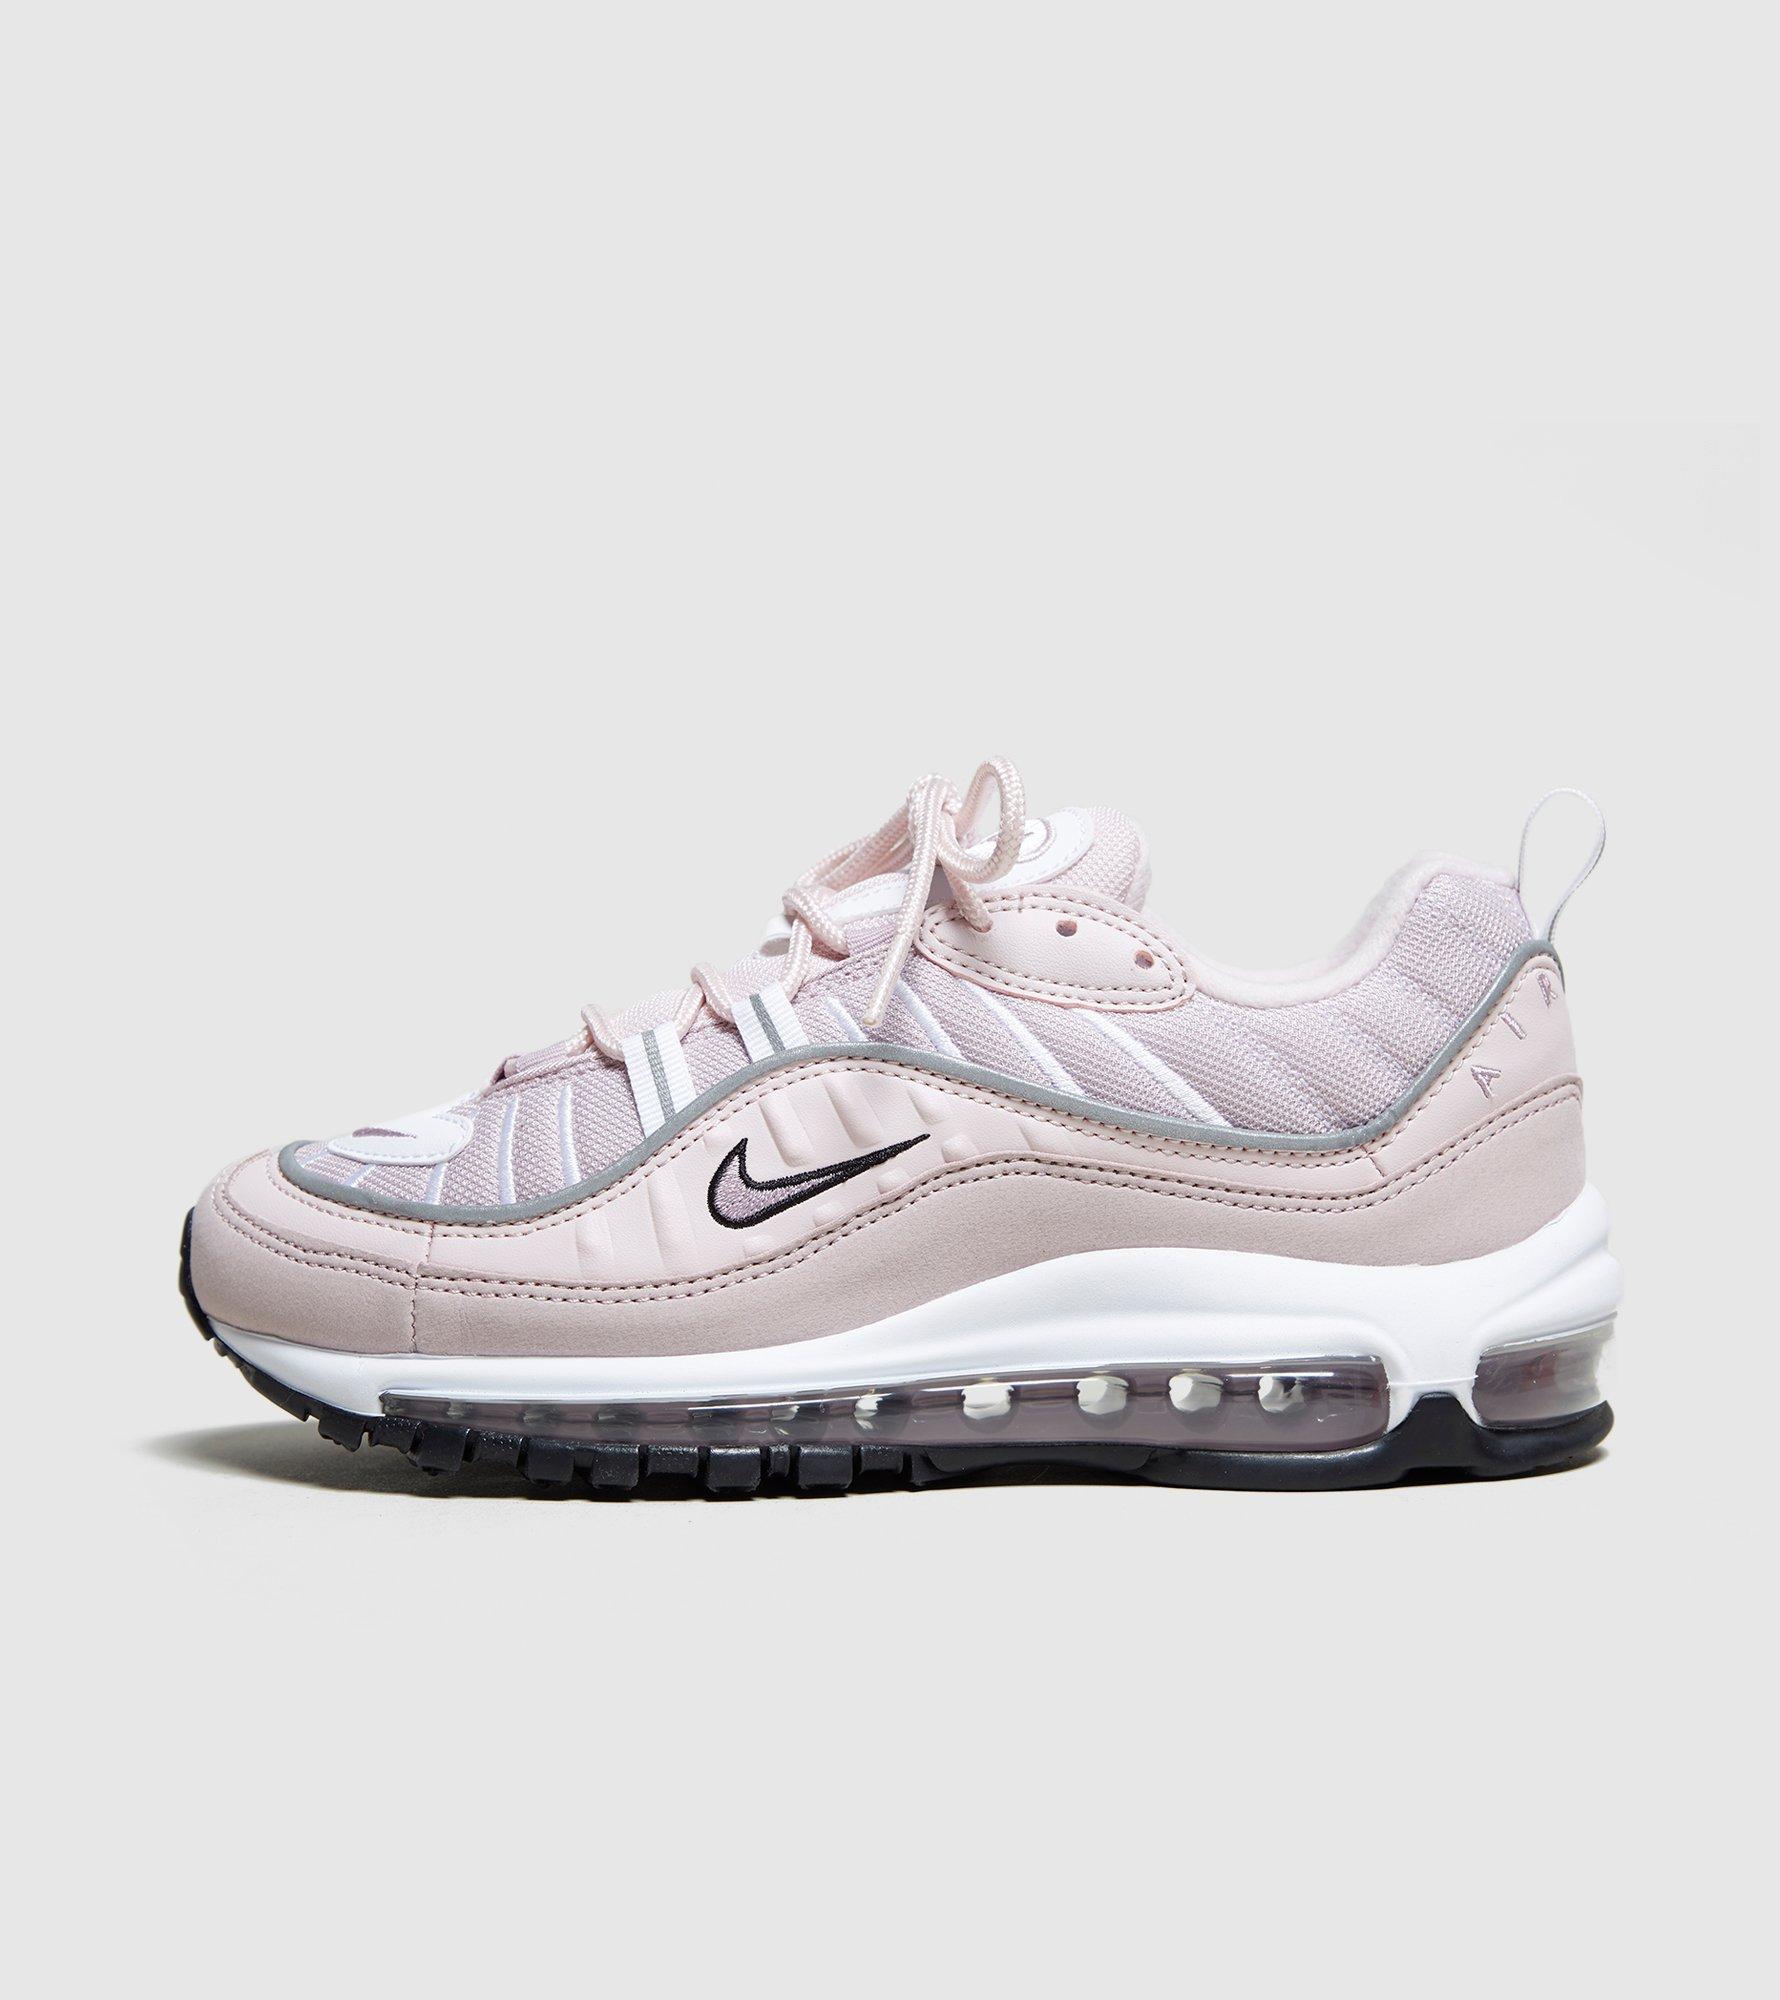 separation shoes f810f 2eaab air max 98 femme